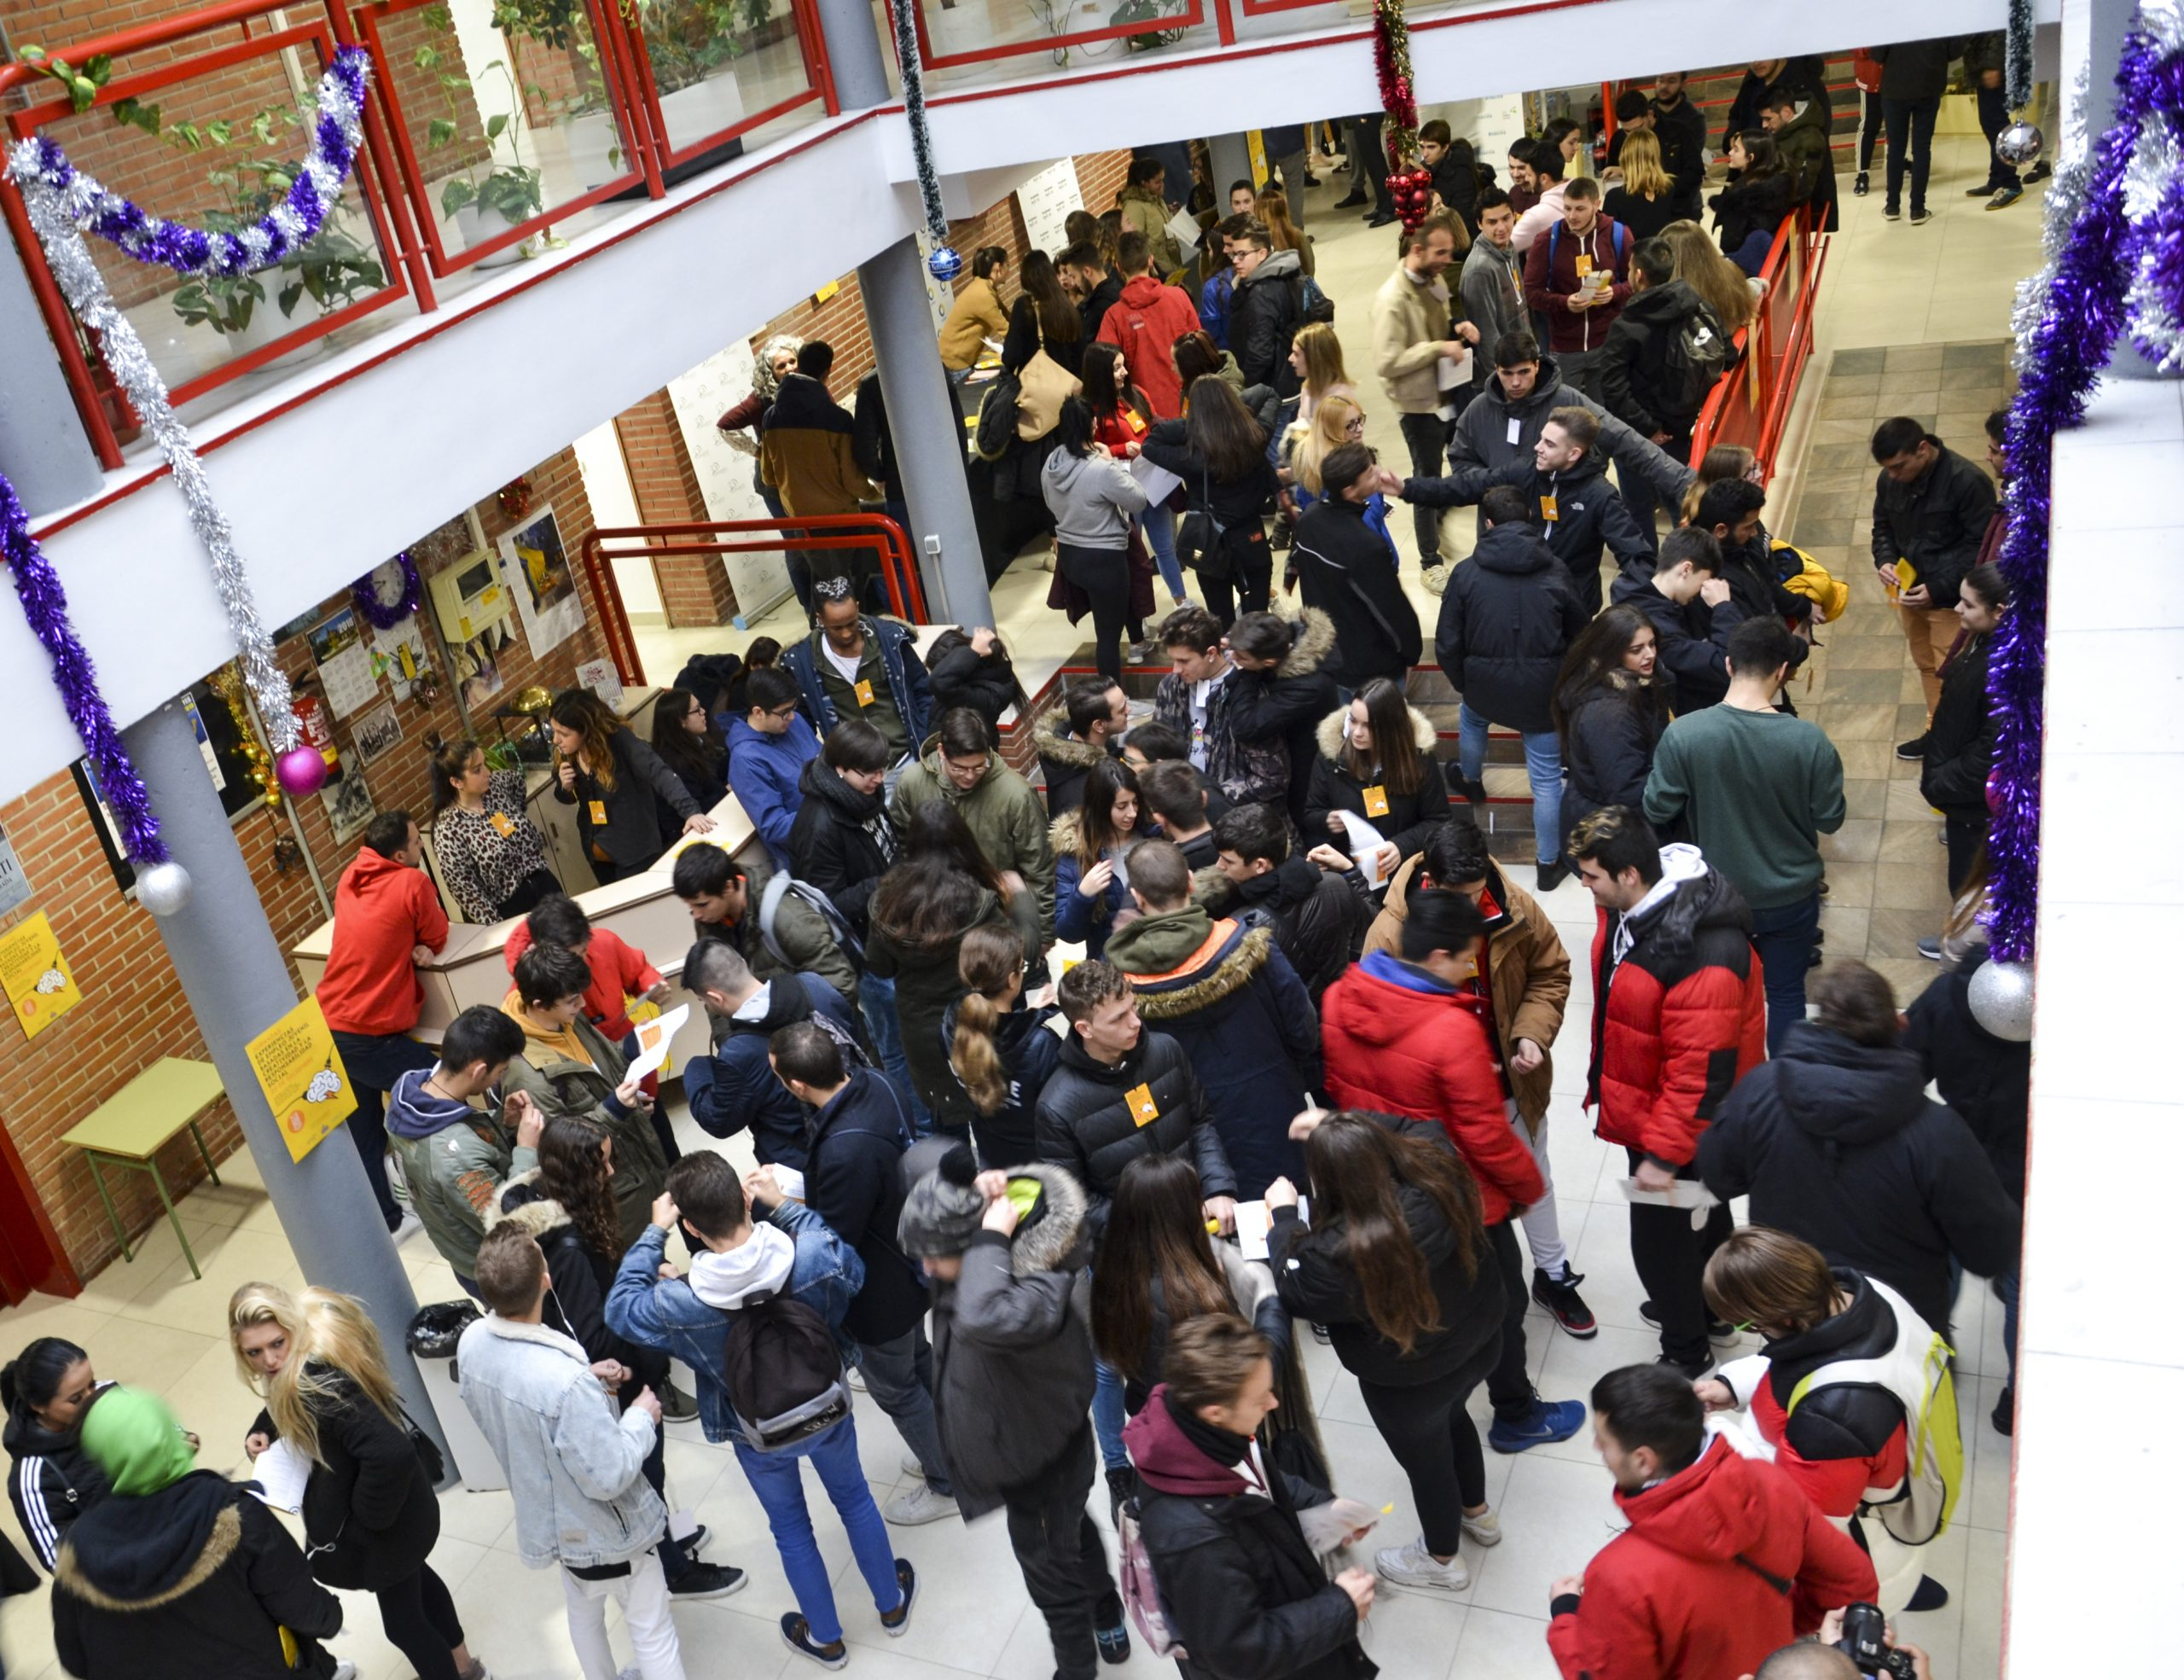 Jornadas-Mejorada-20-12-2018-24-scaled